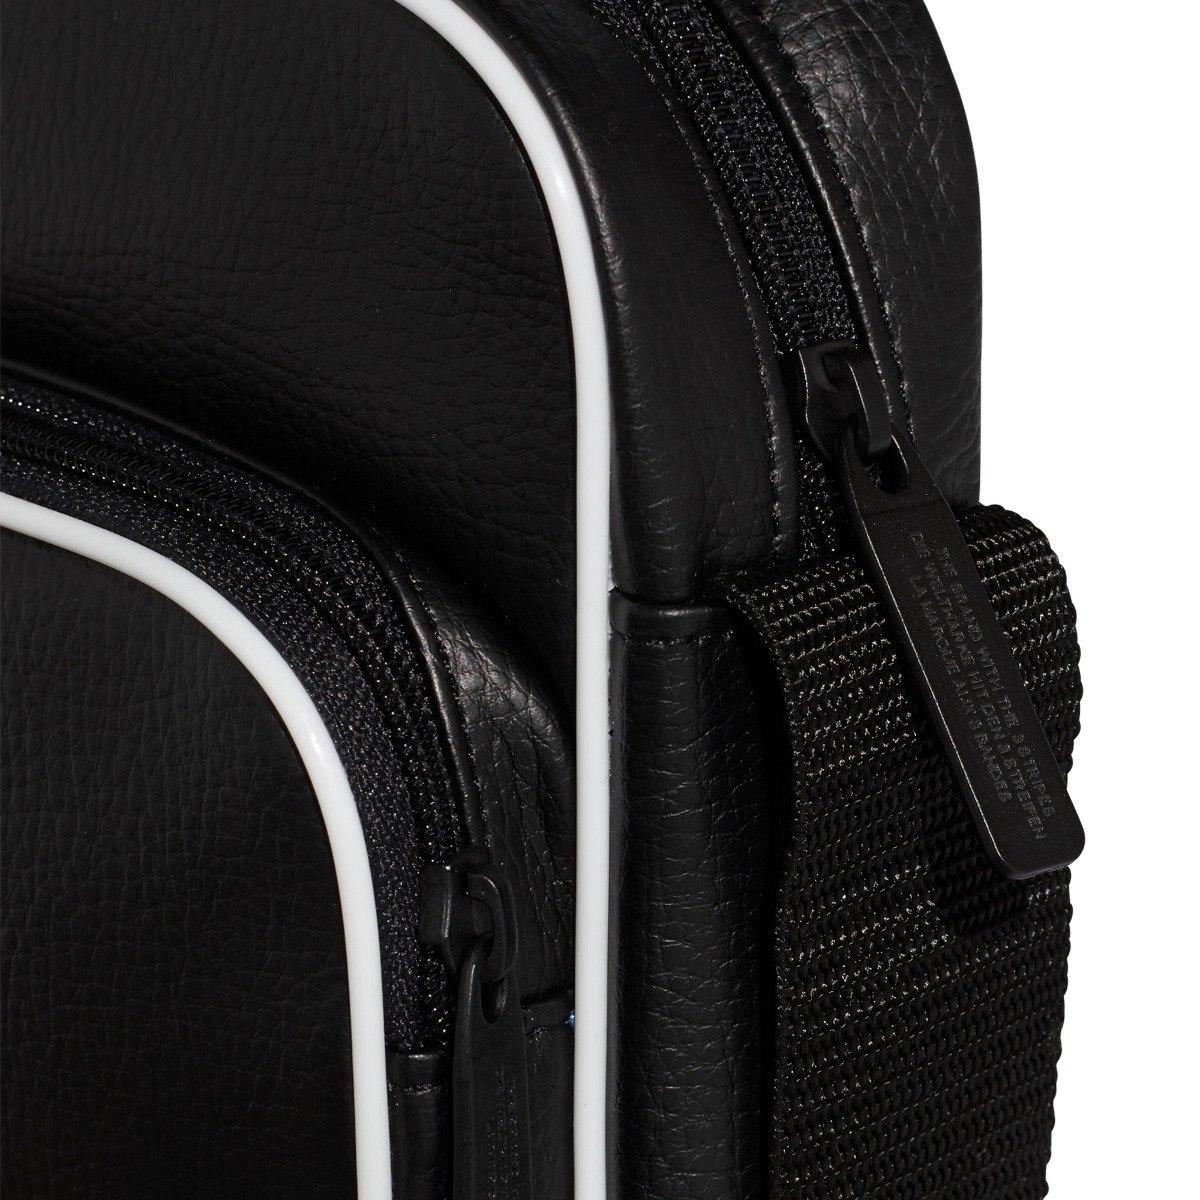 af50b942 Bolso adidas Mini Vintage Negro Unisex- Originals - $ 1.499,00 en ...